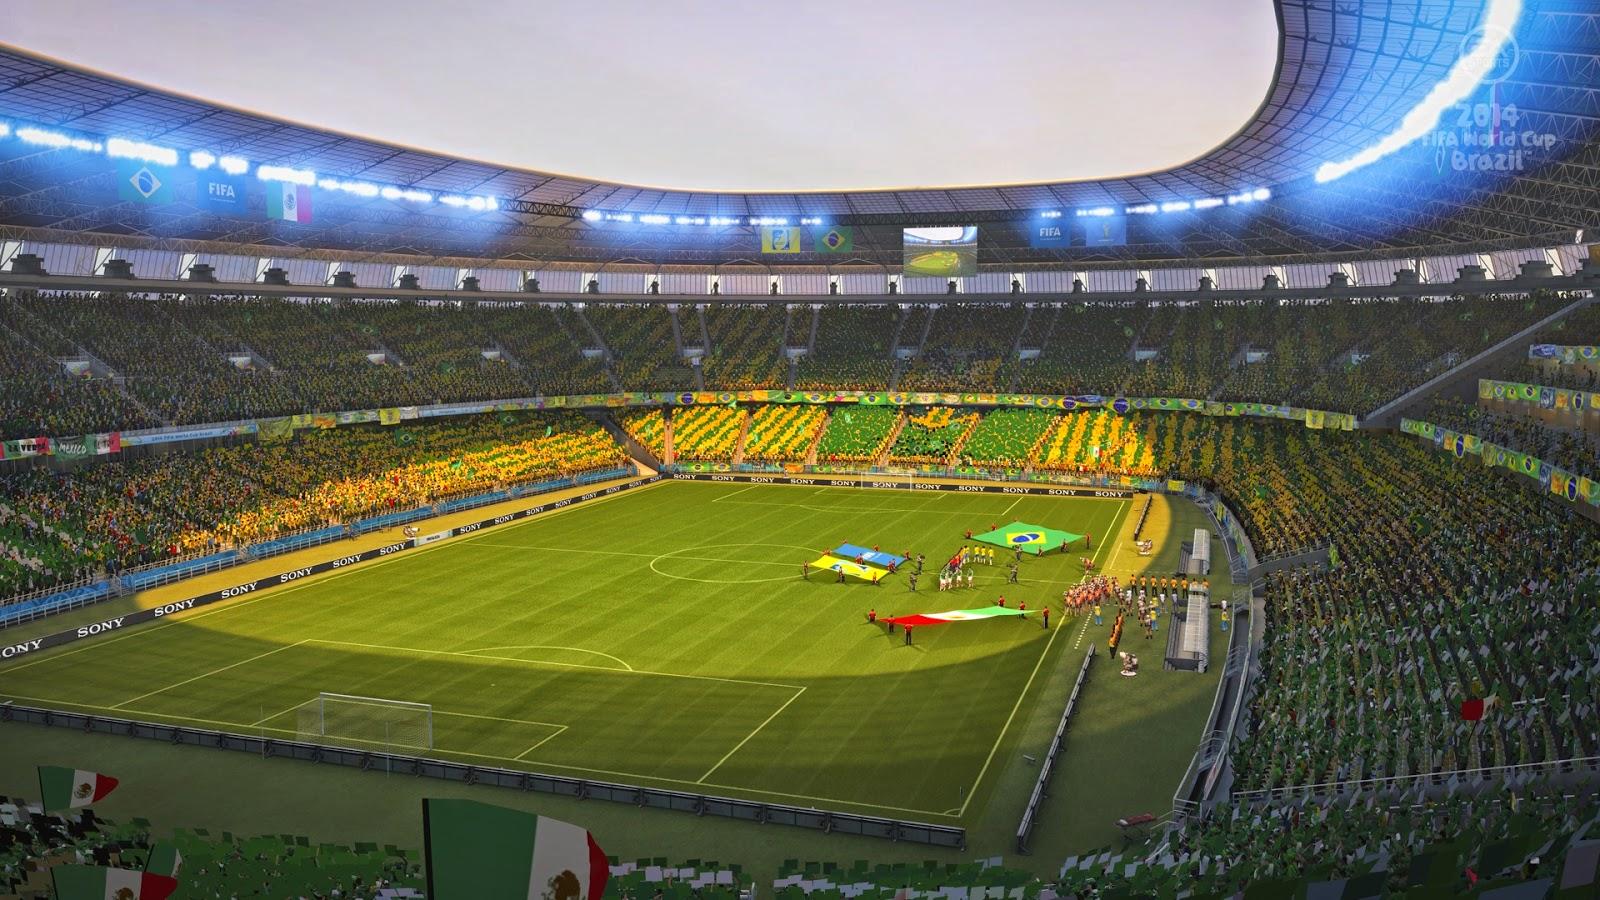 FIFA worldcup Brazil 2014 opening stadium